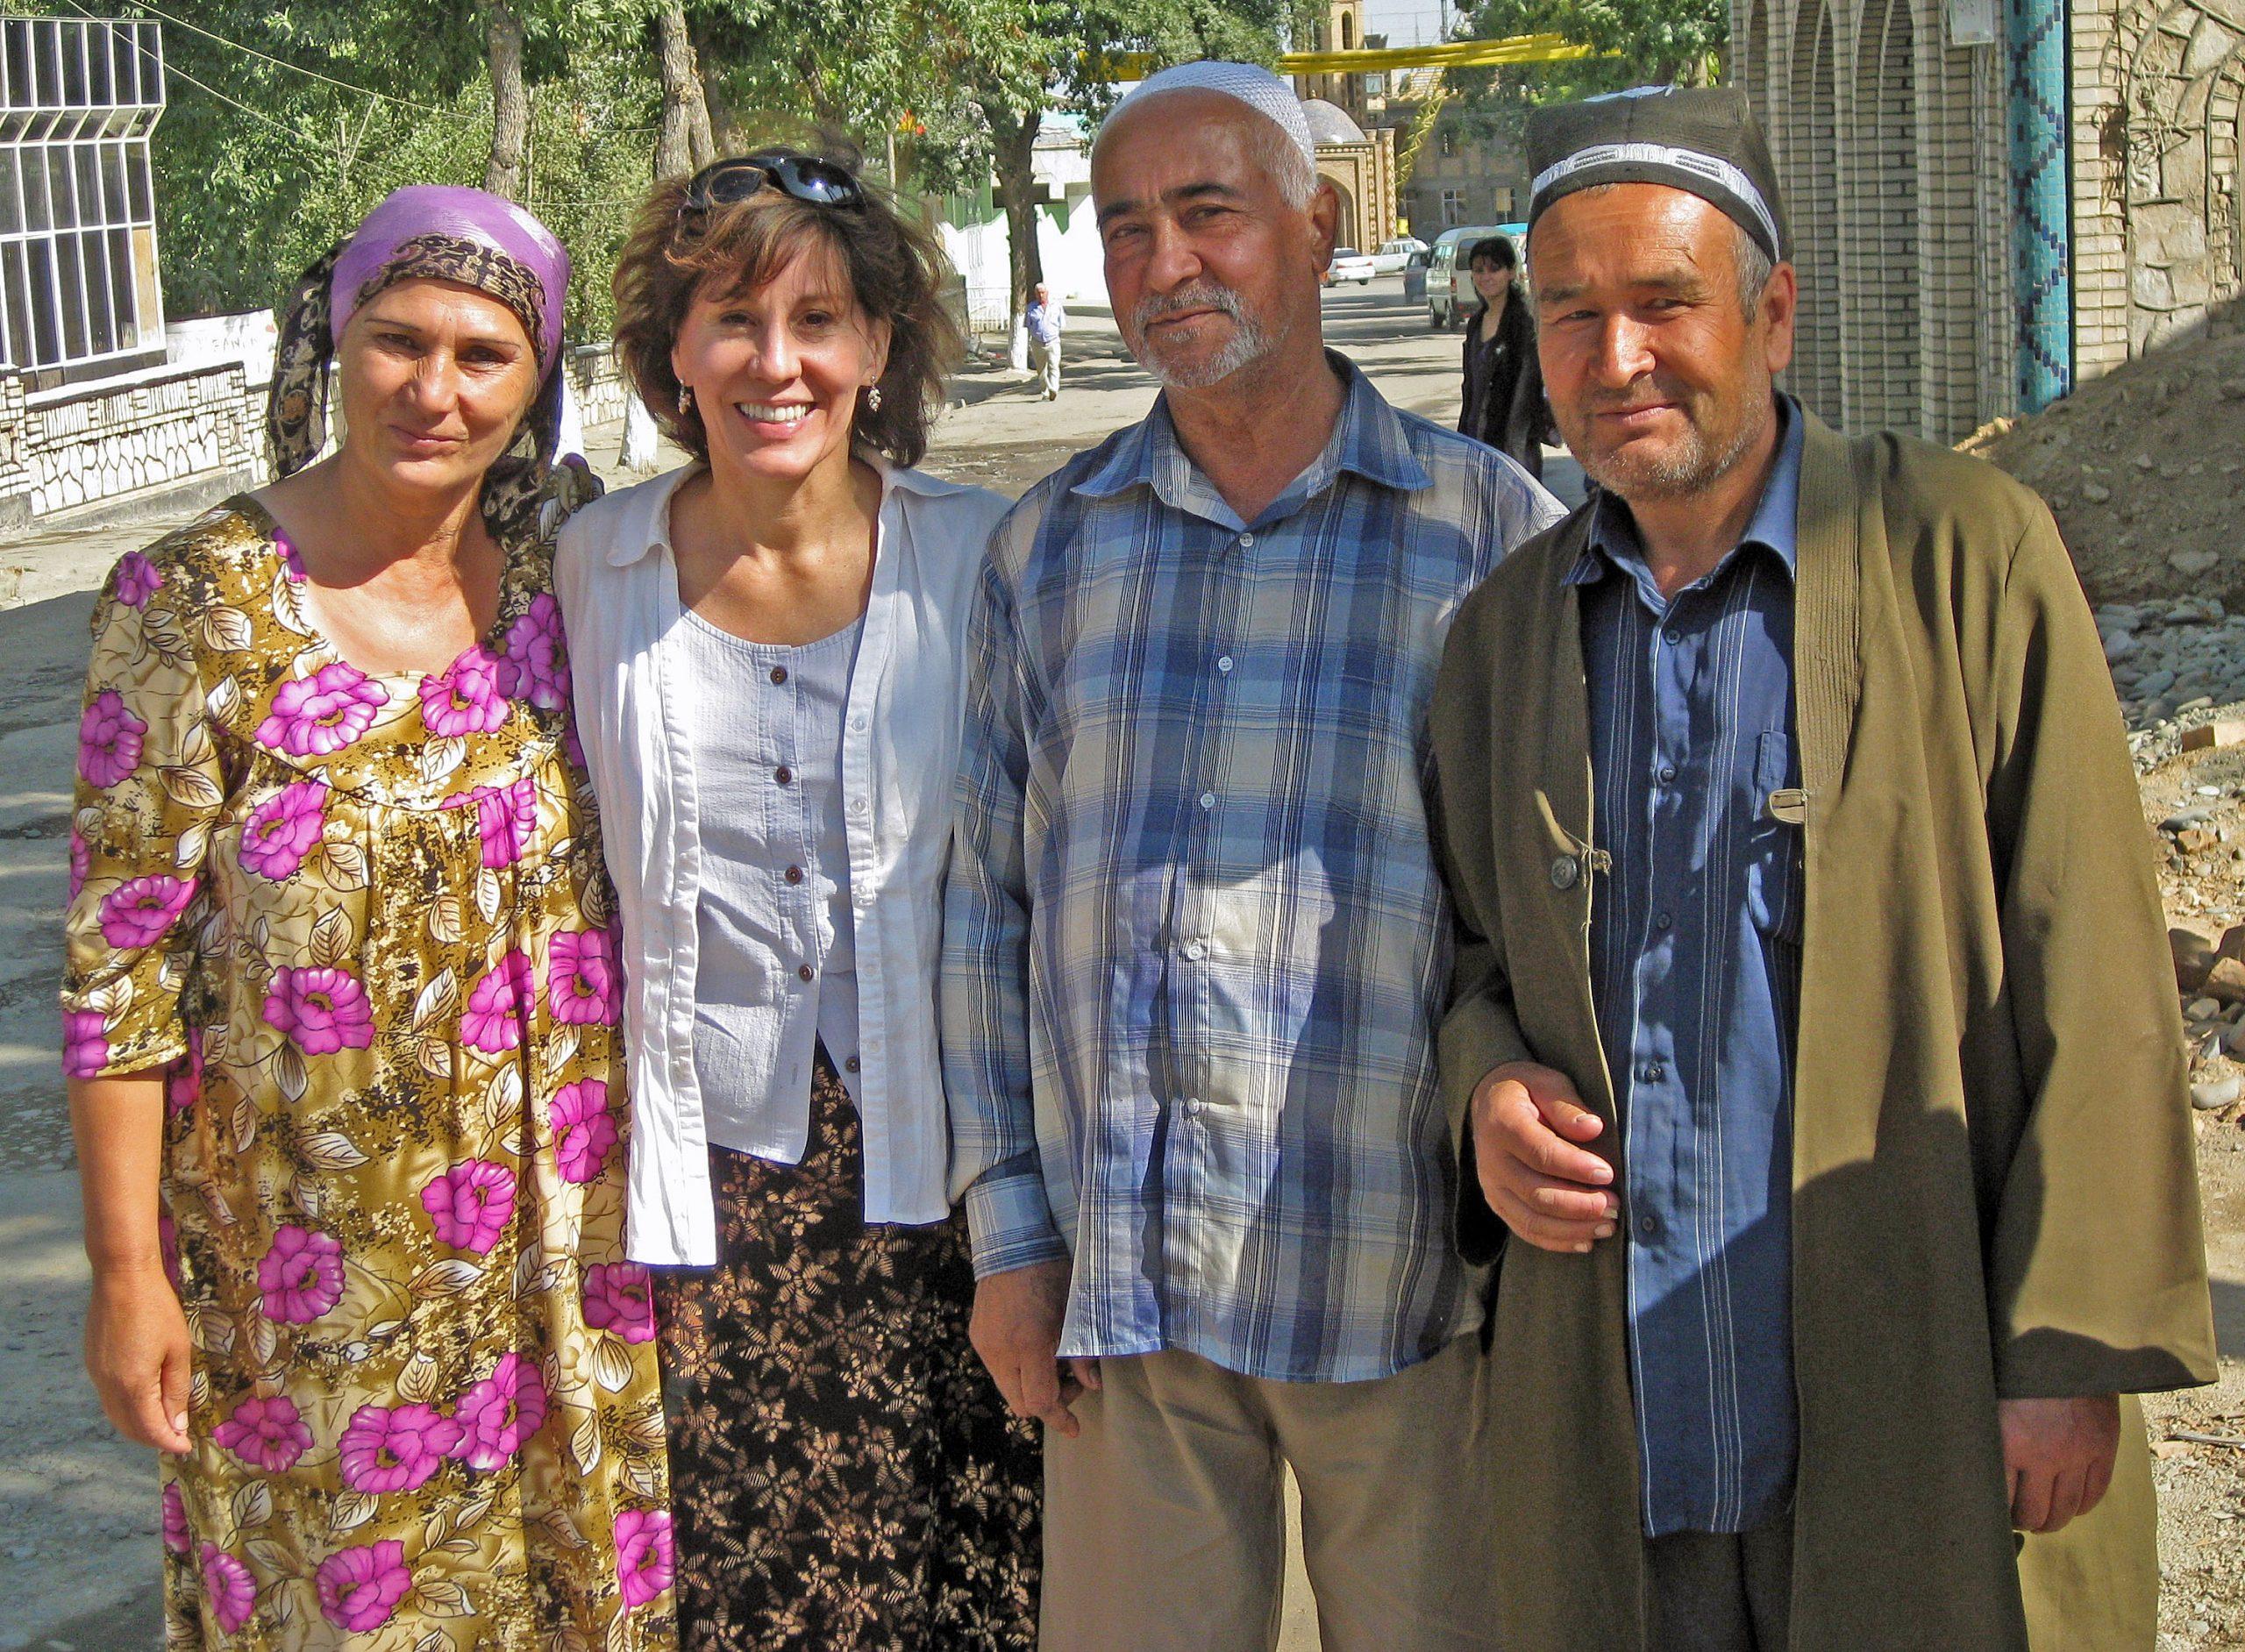 I'm surrounded by that warm and welcoming spirit of Uzbeks, and Uzbekistan (2008)